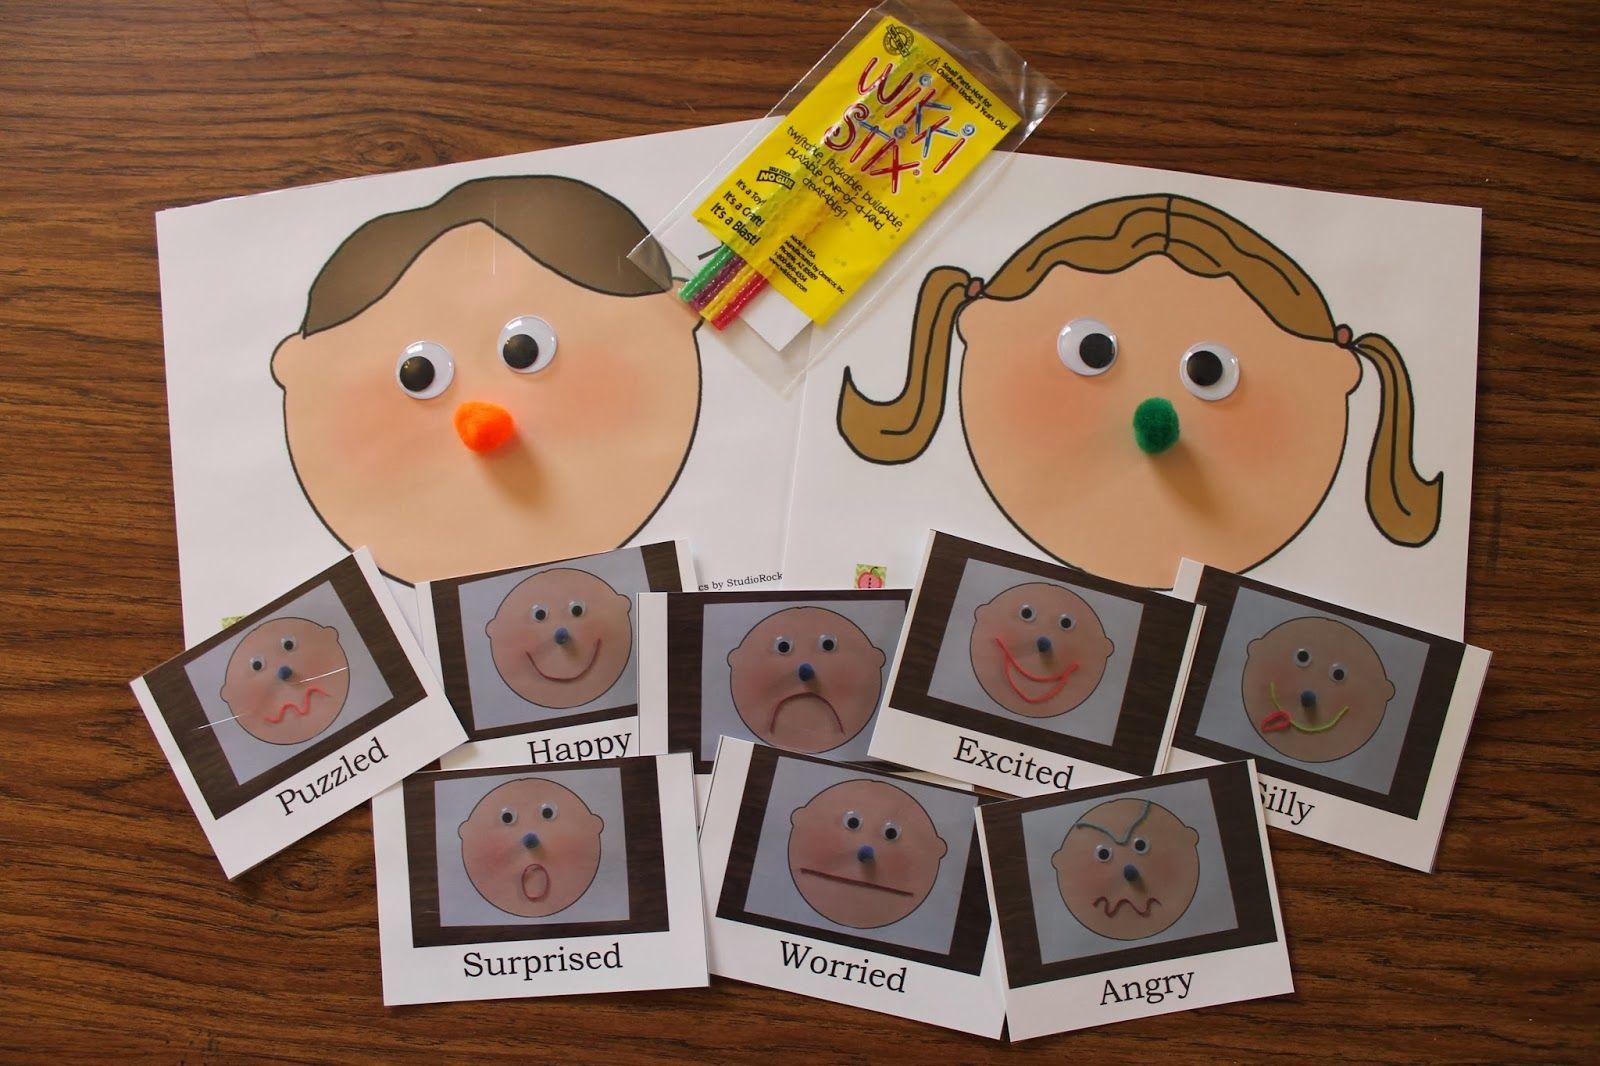 Preschool And Playschool Feelings And Emotions Unit